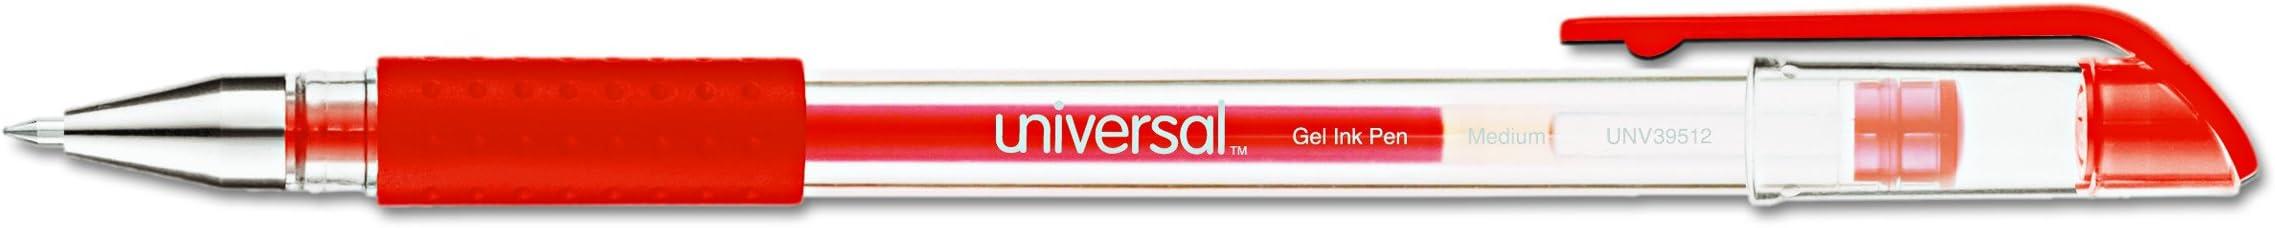 Universal 39512 Roller Ball Stick Gel Pen Dozen Medium Red Ink